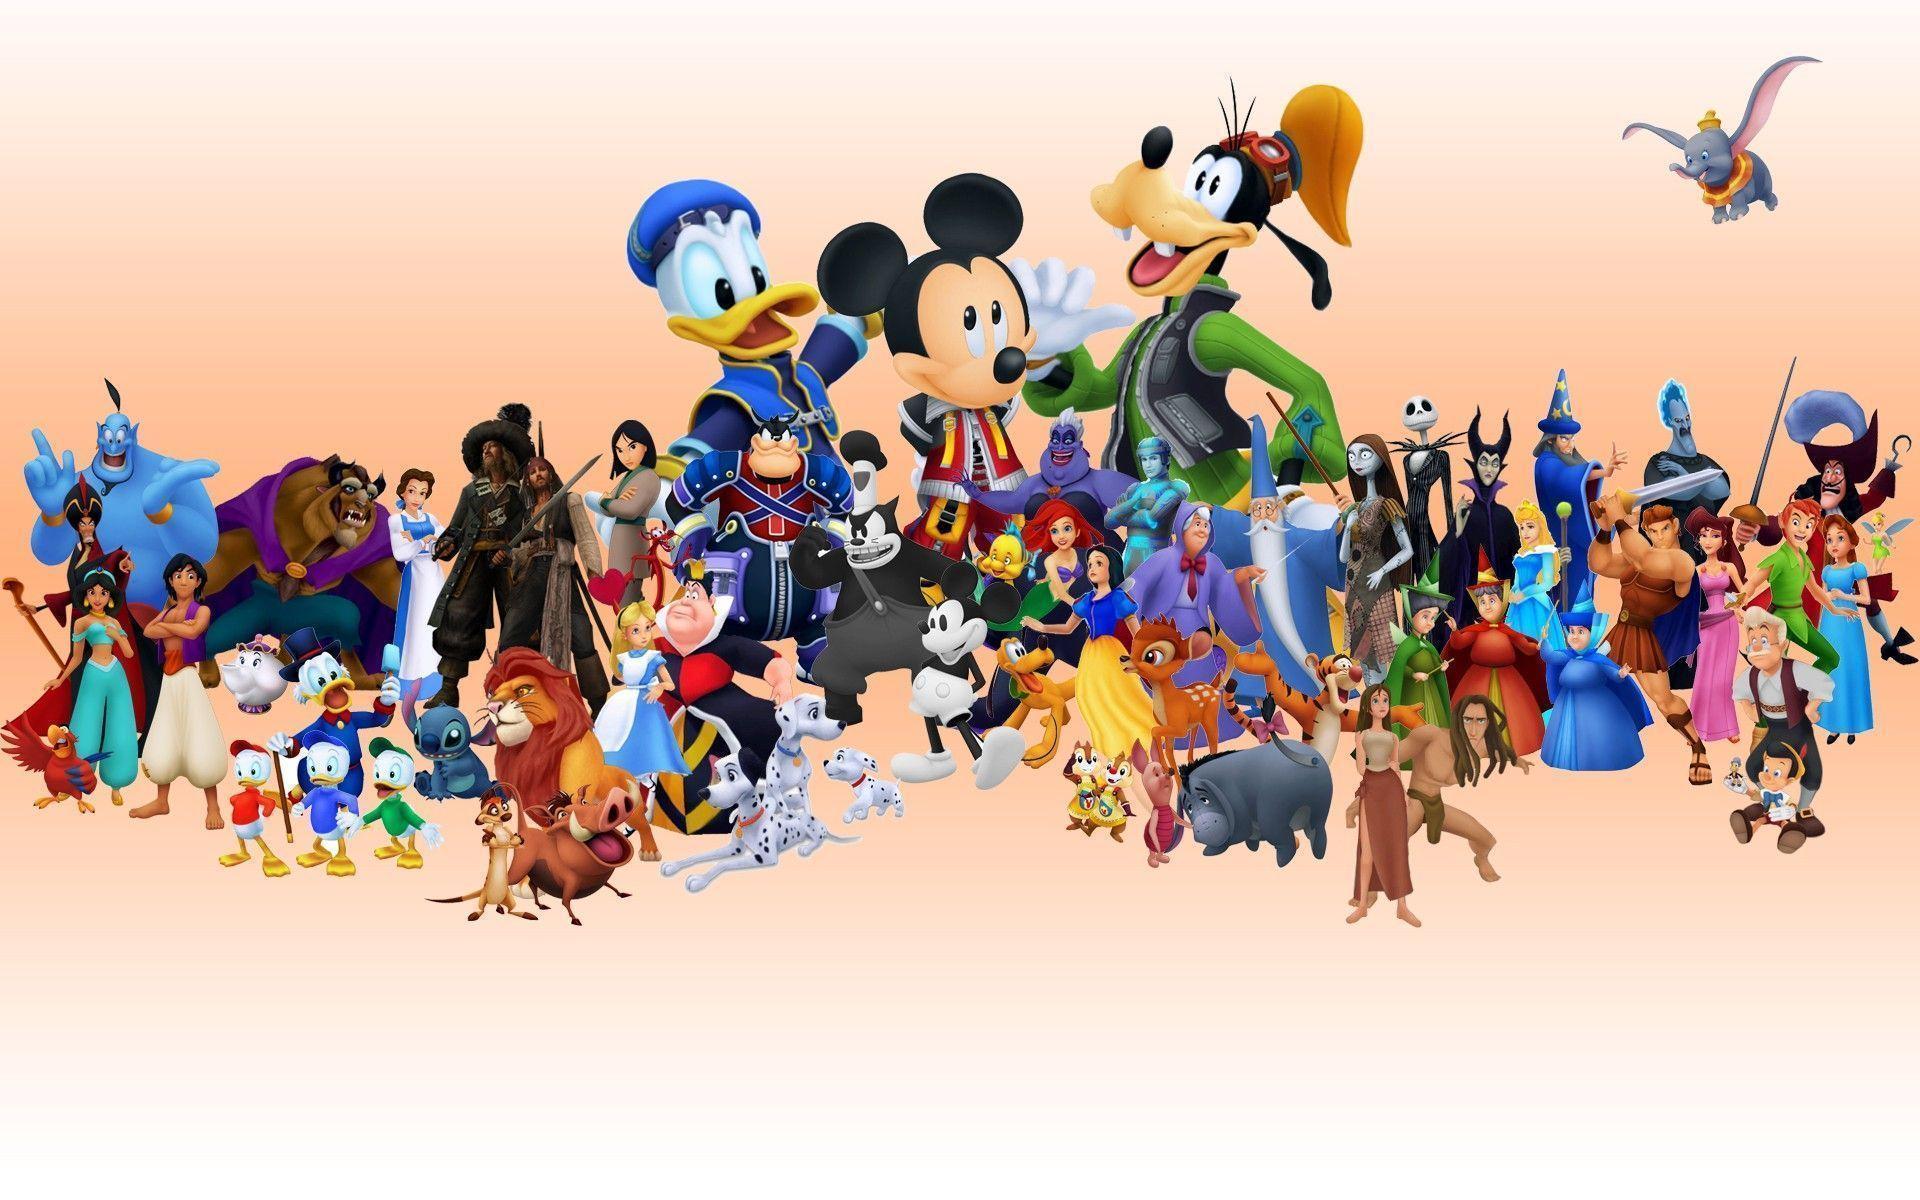 Cute Disney Characters Desktop Wallpapers Top Free Cute Disney Characters Desktop Backgrounds Wallpaperaccess